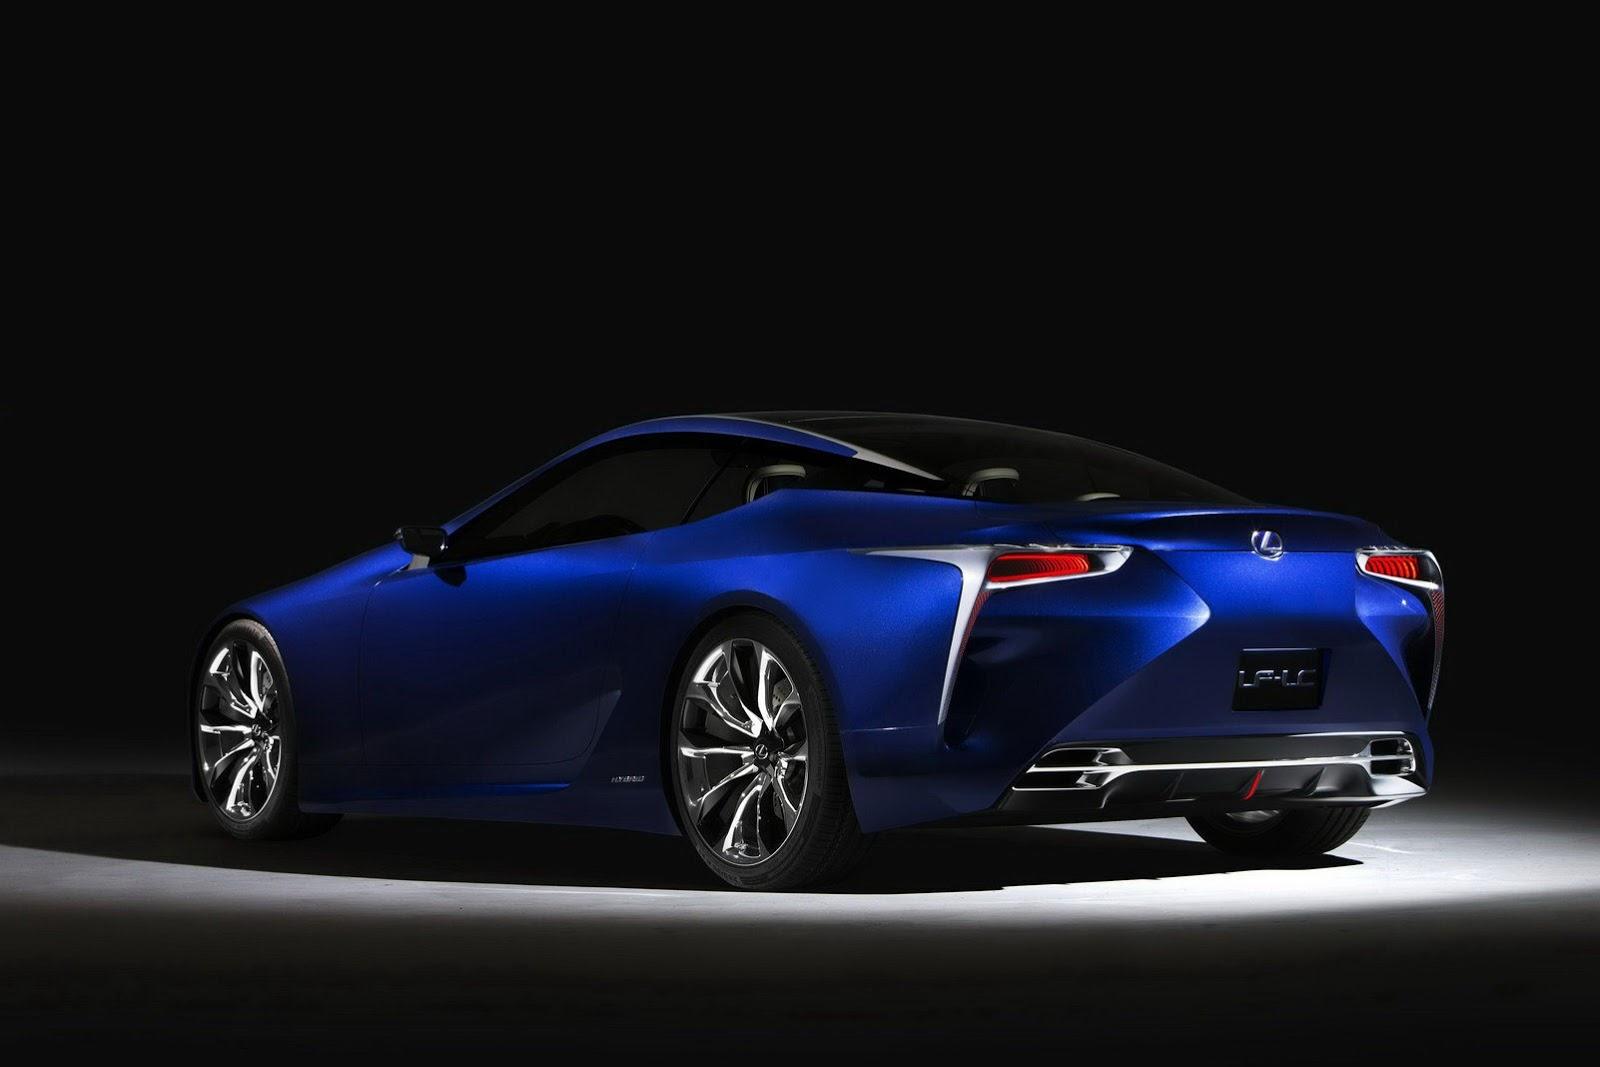 https://s1.cdn.autoevolution.com/images/news/gallery/lexus-unveils-blue-lf-lc-concept-for-sydney-auto-show-photo-gallery_9.jpg